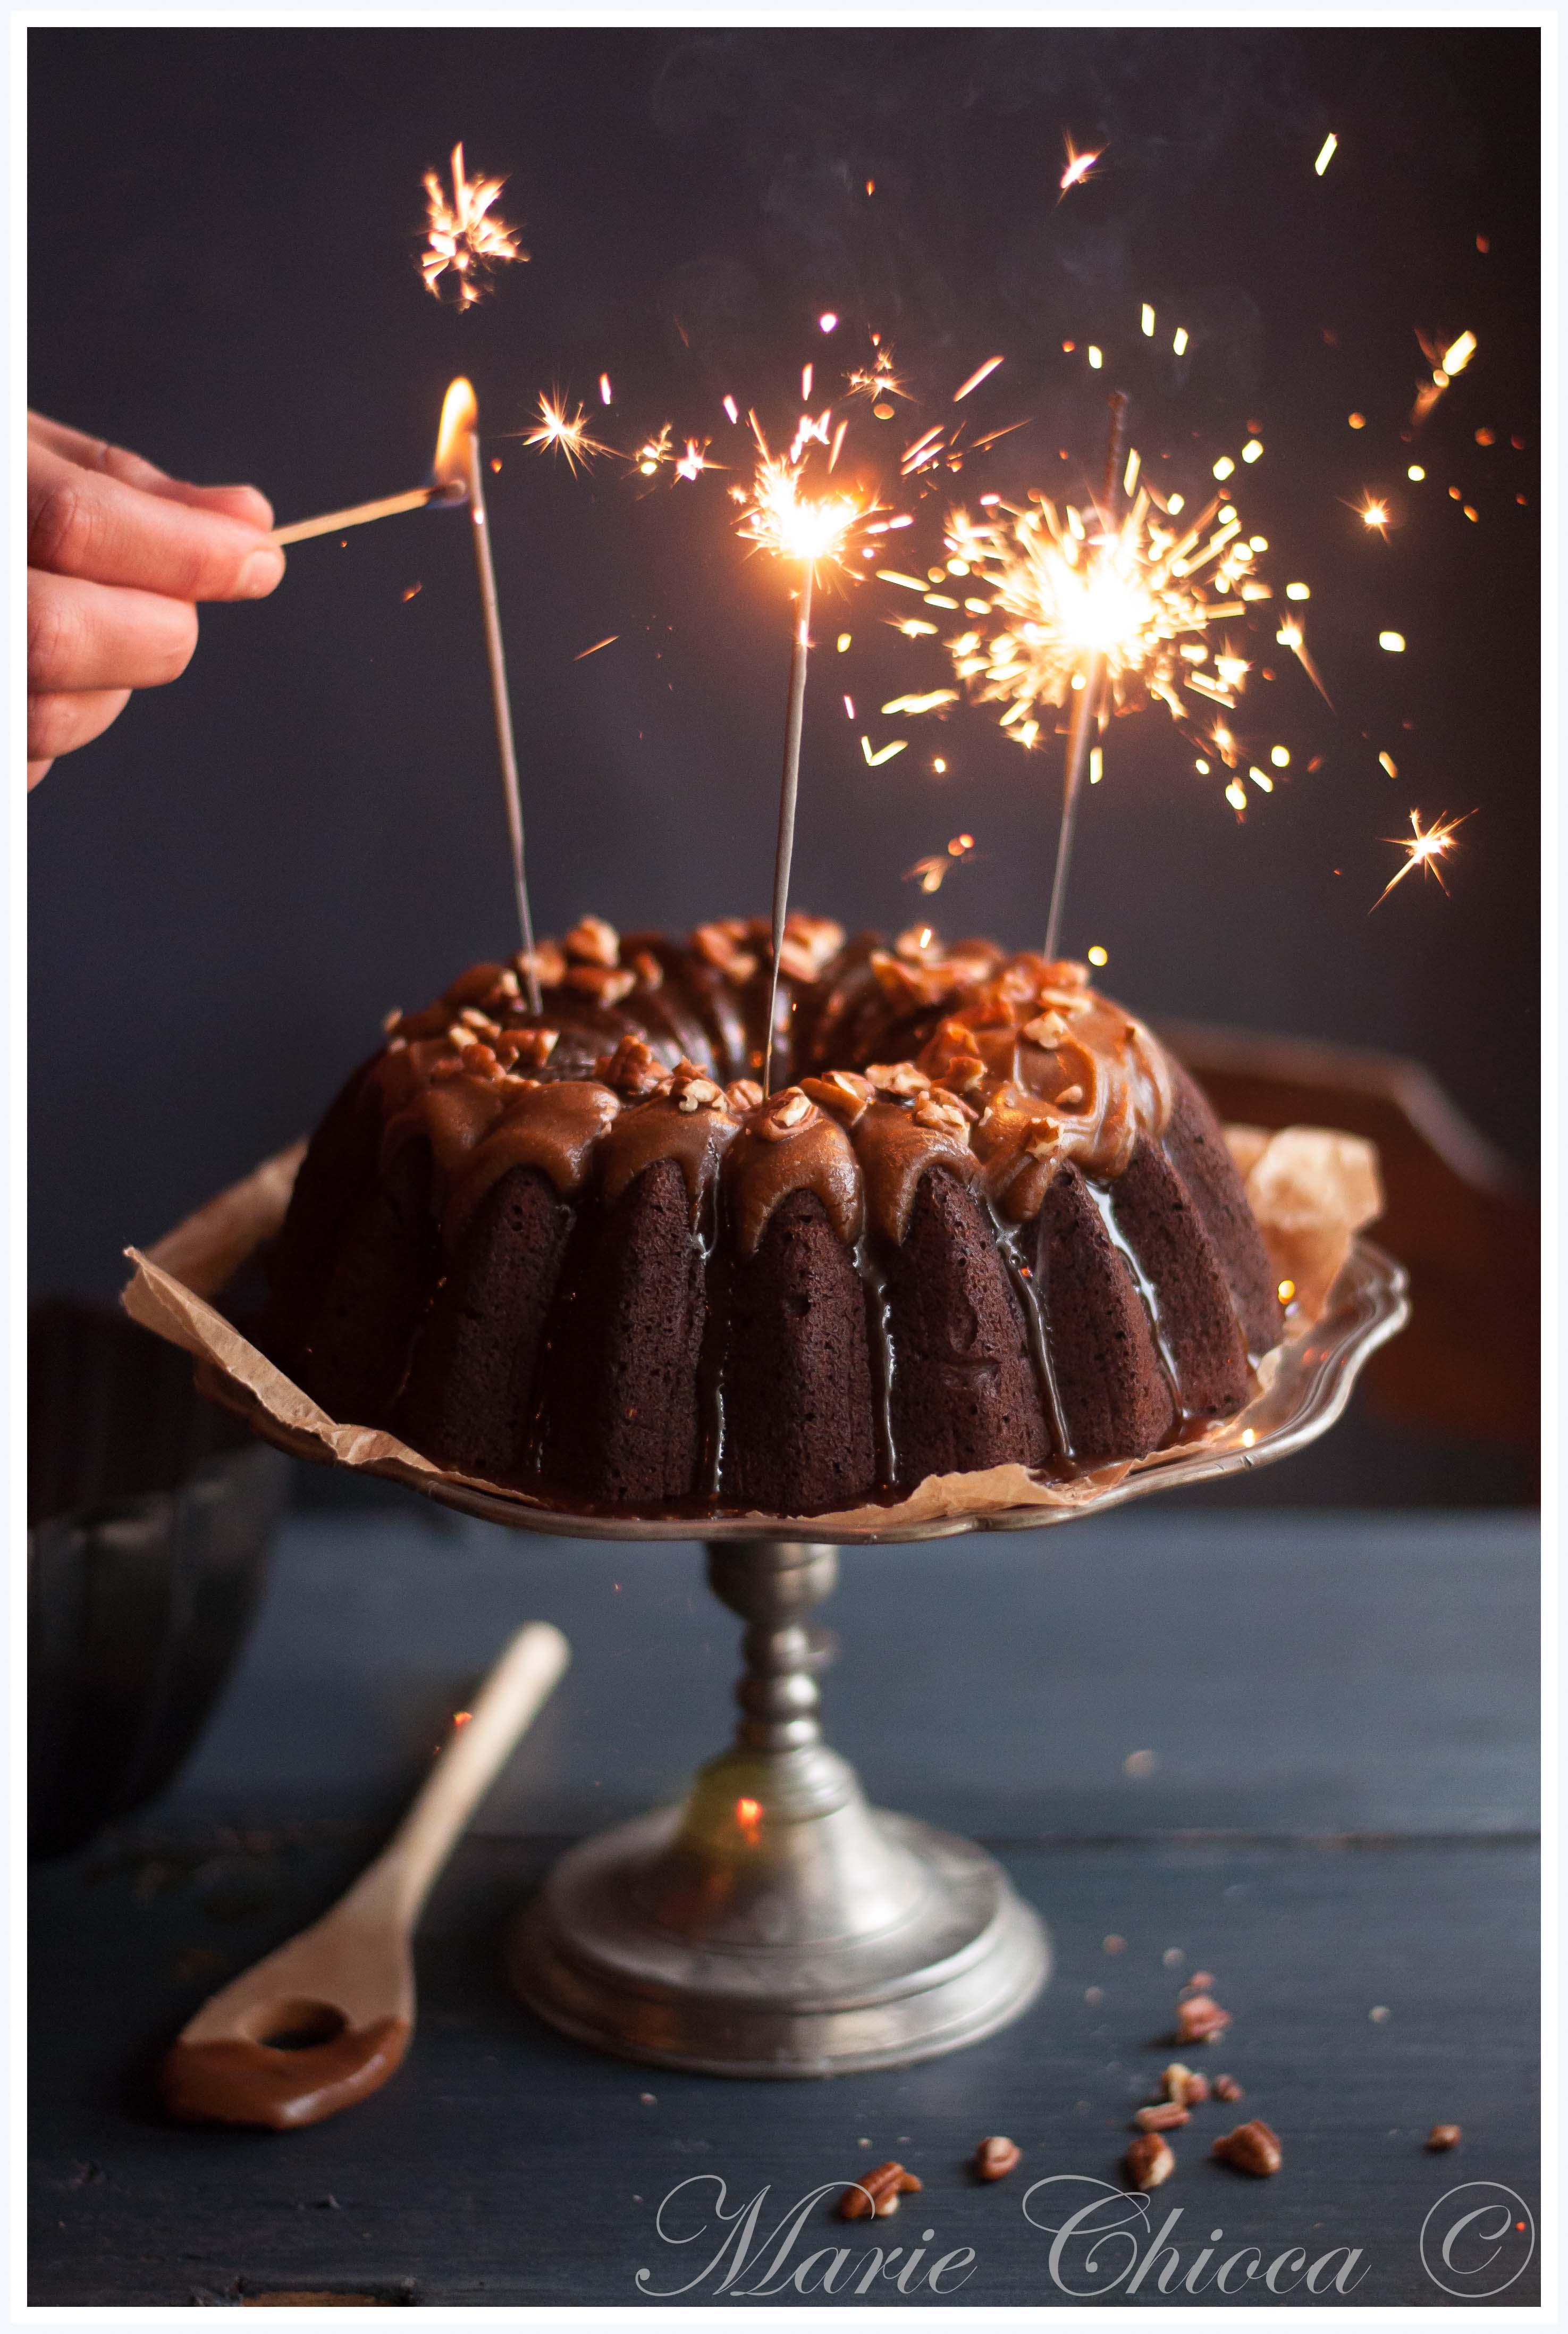 anniversaire-gros-brownie2-2